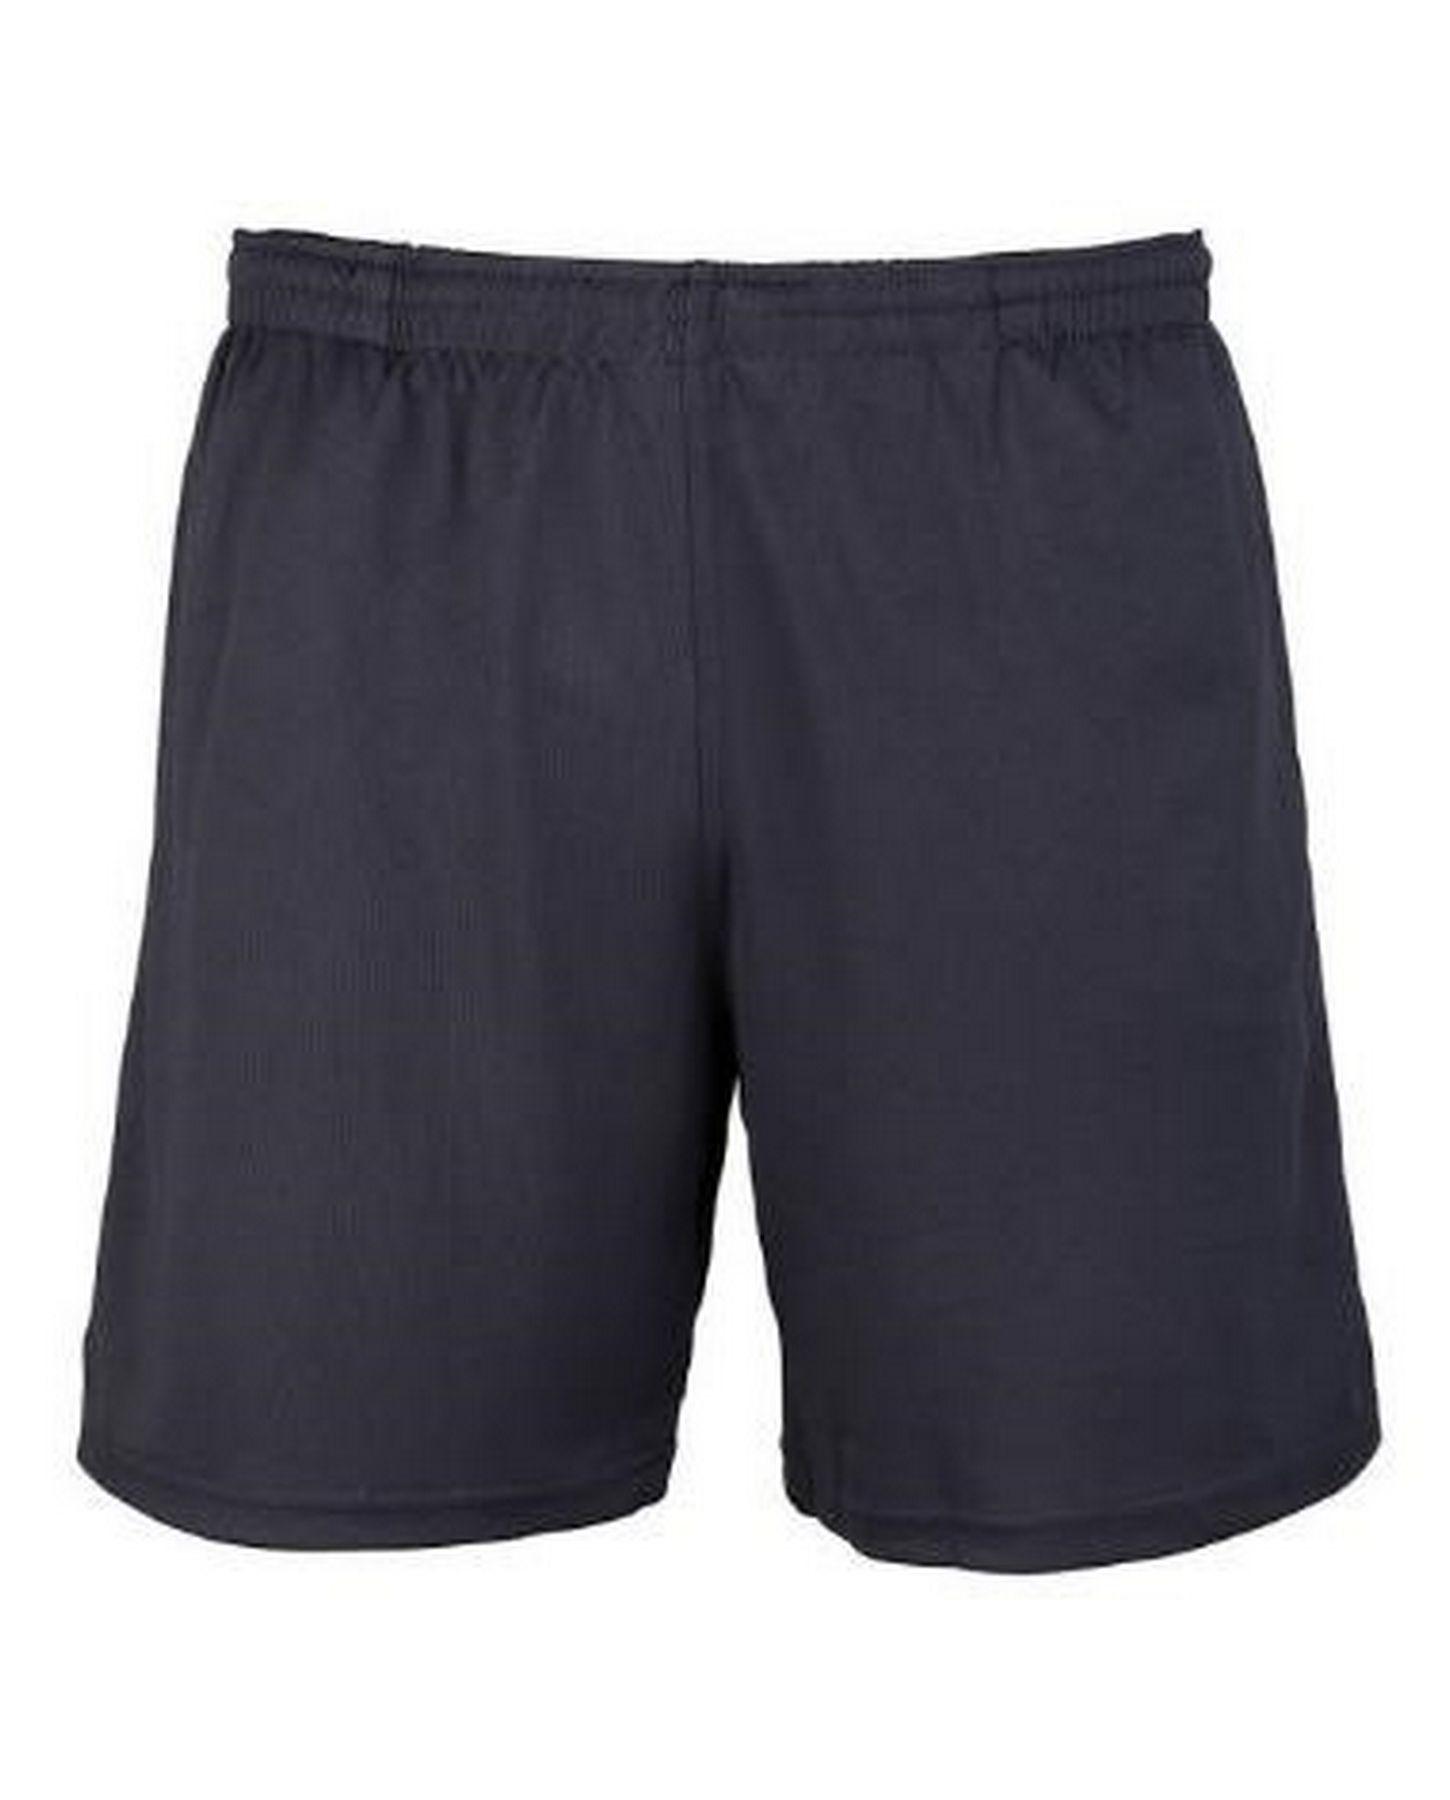 Littleport Lions Korfball – Shorts